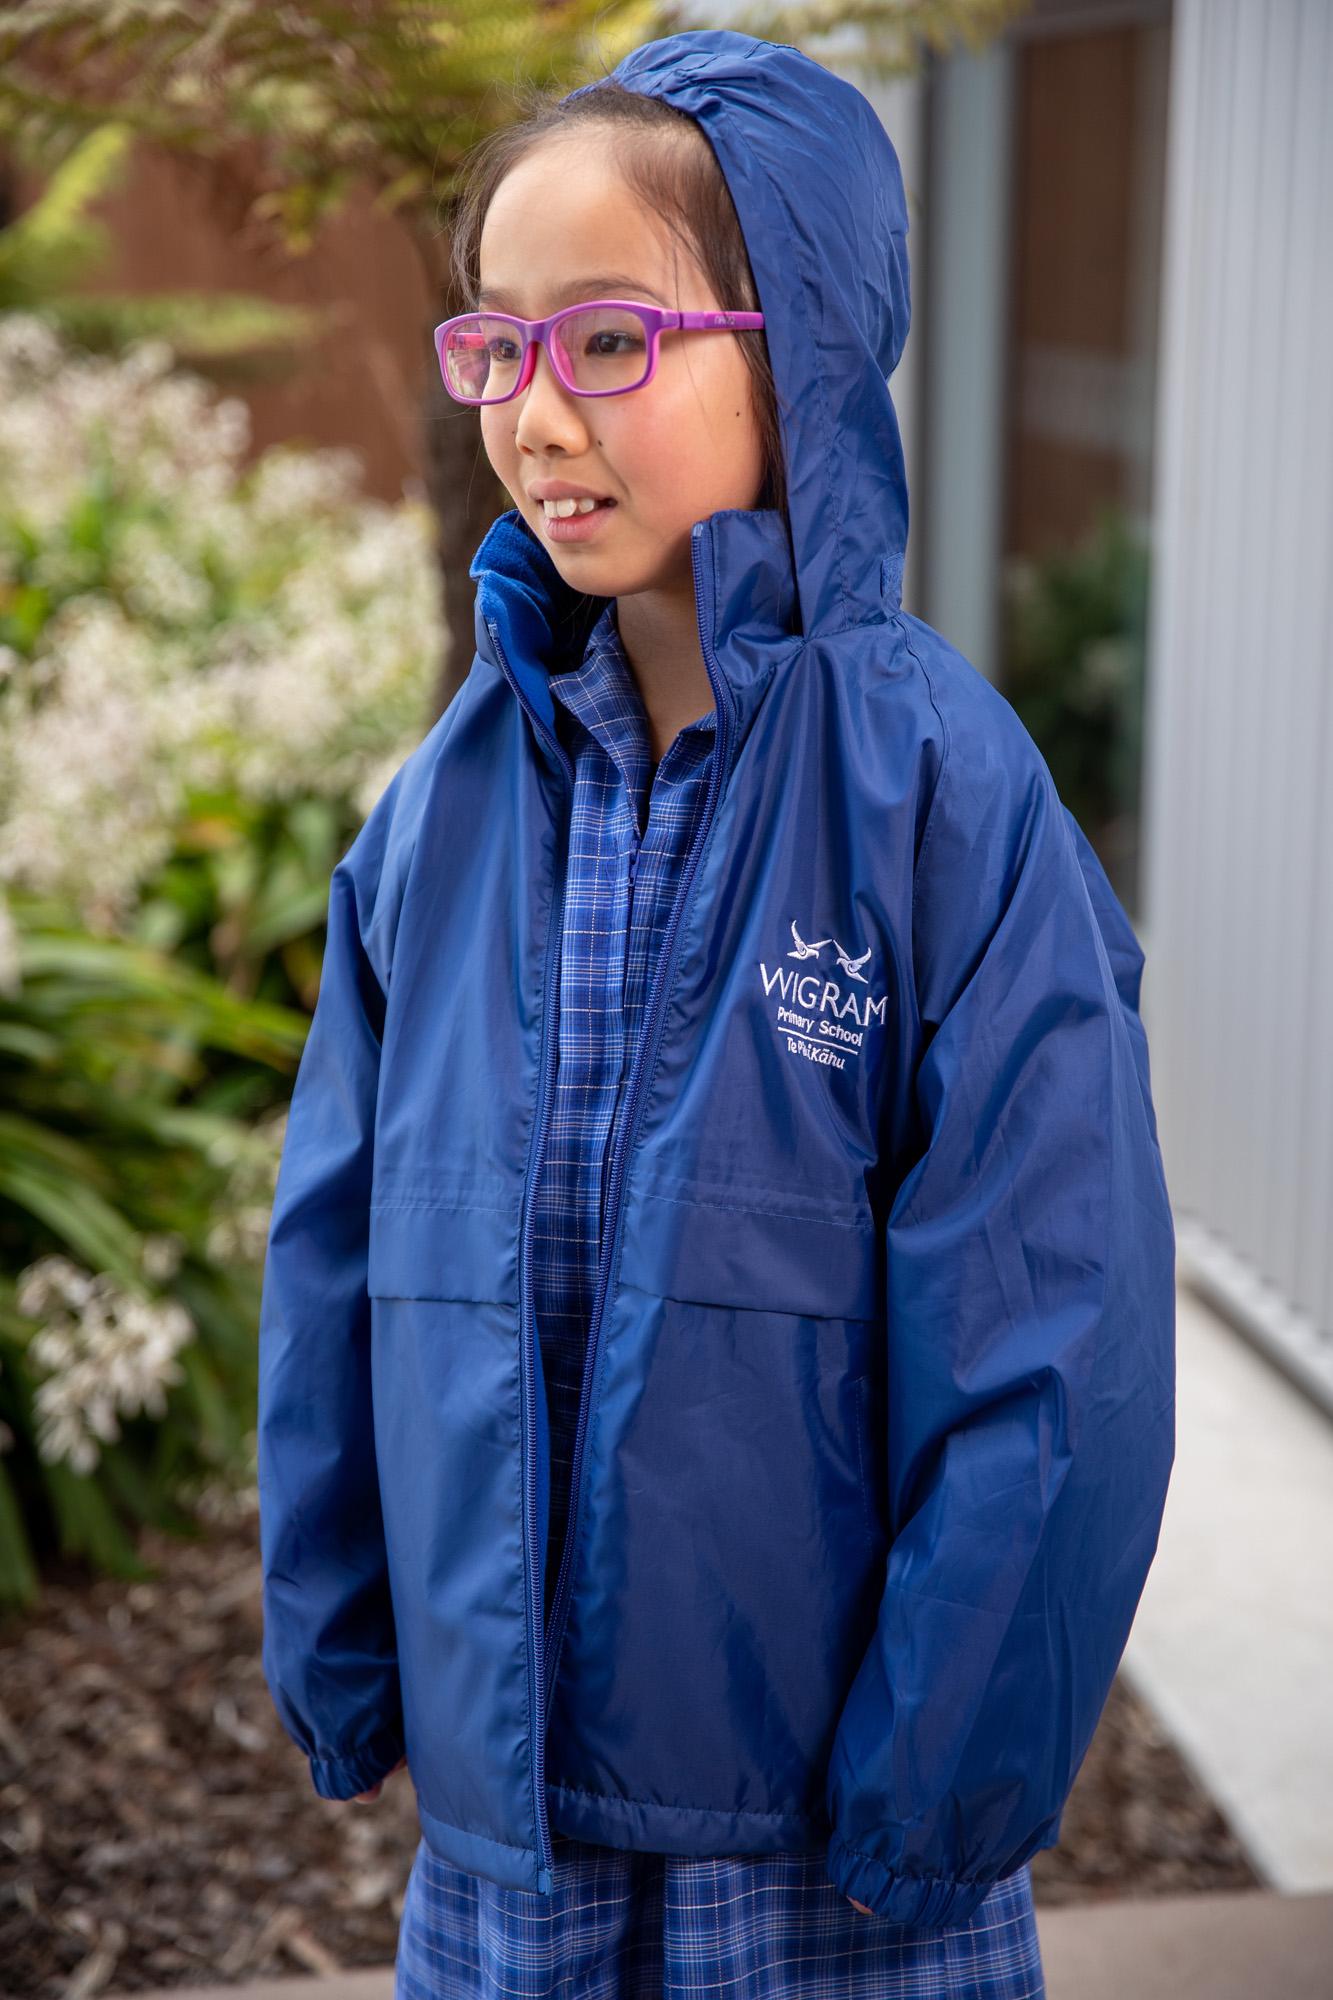 female Wigram Primary student wearing purple glasses and blue rain jacket